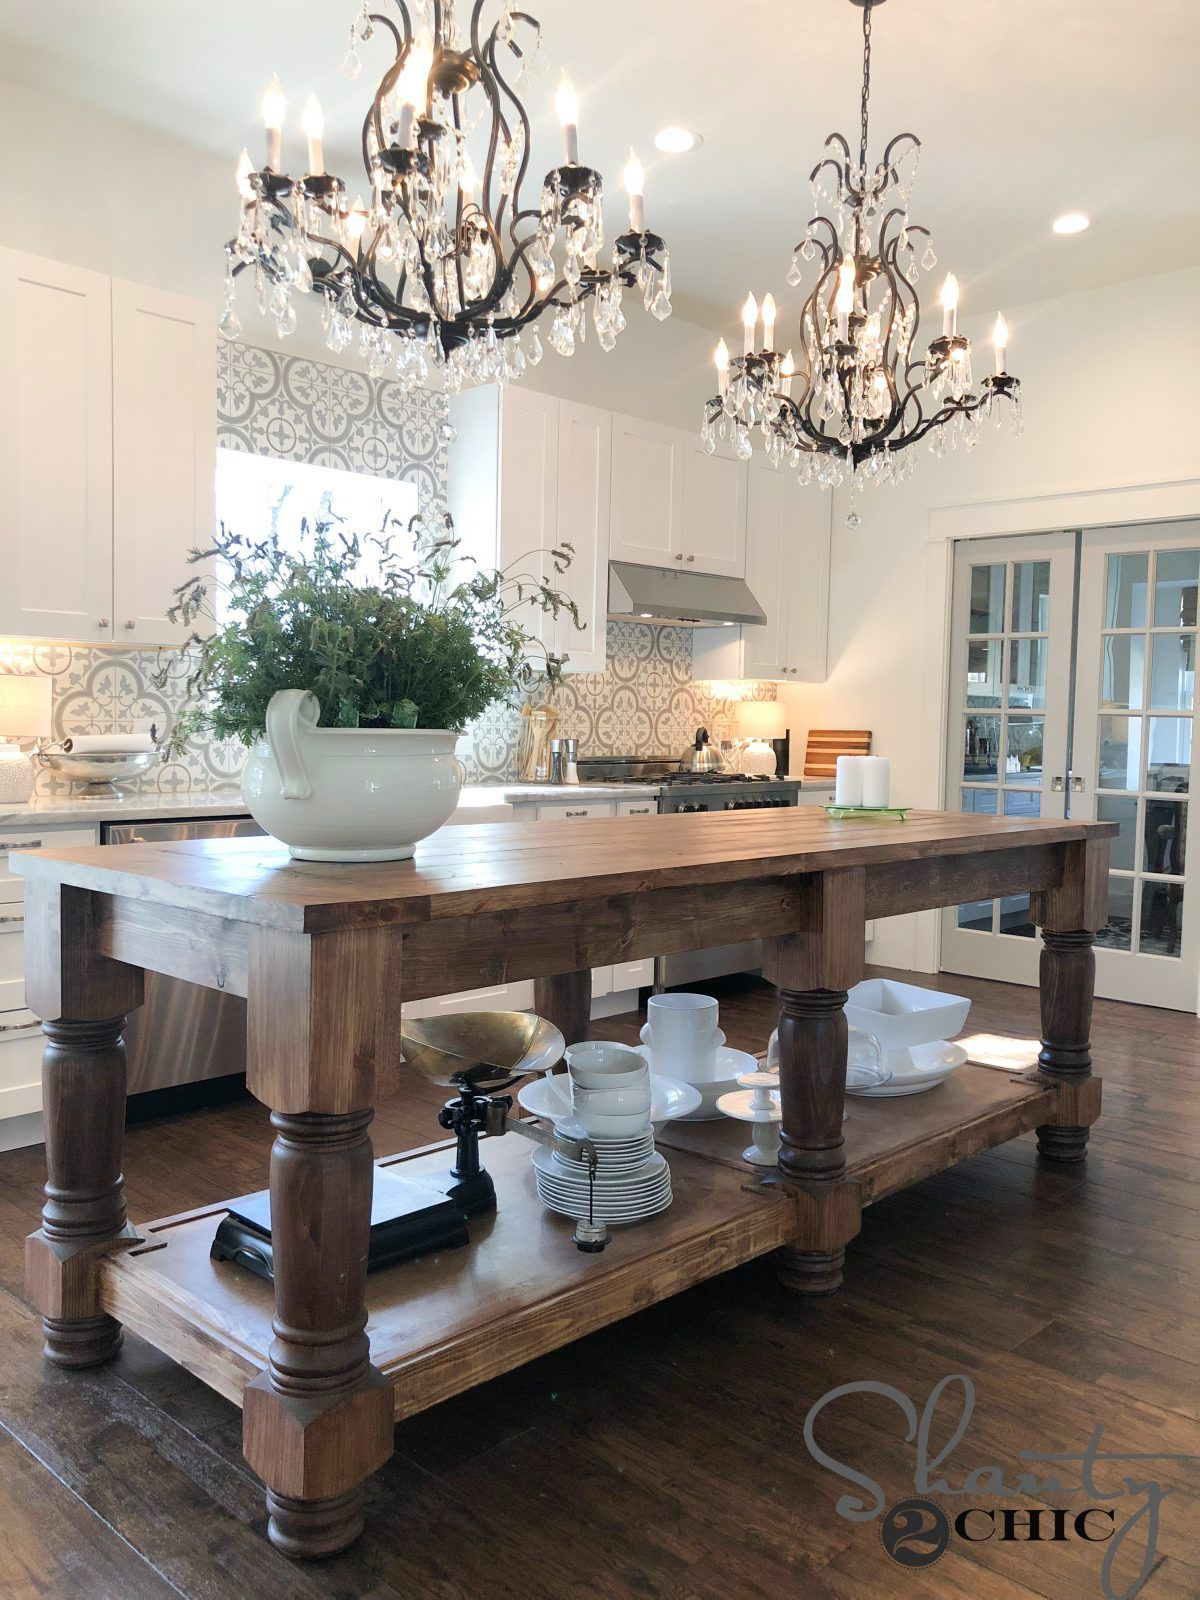 DIY Rustic Farmhouse Island Farmhouse style kitchen